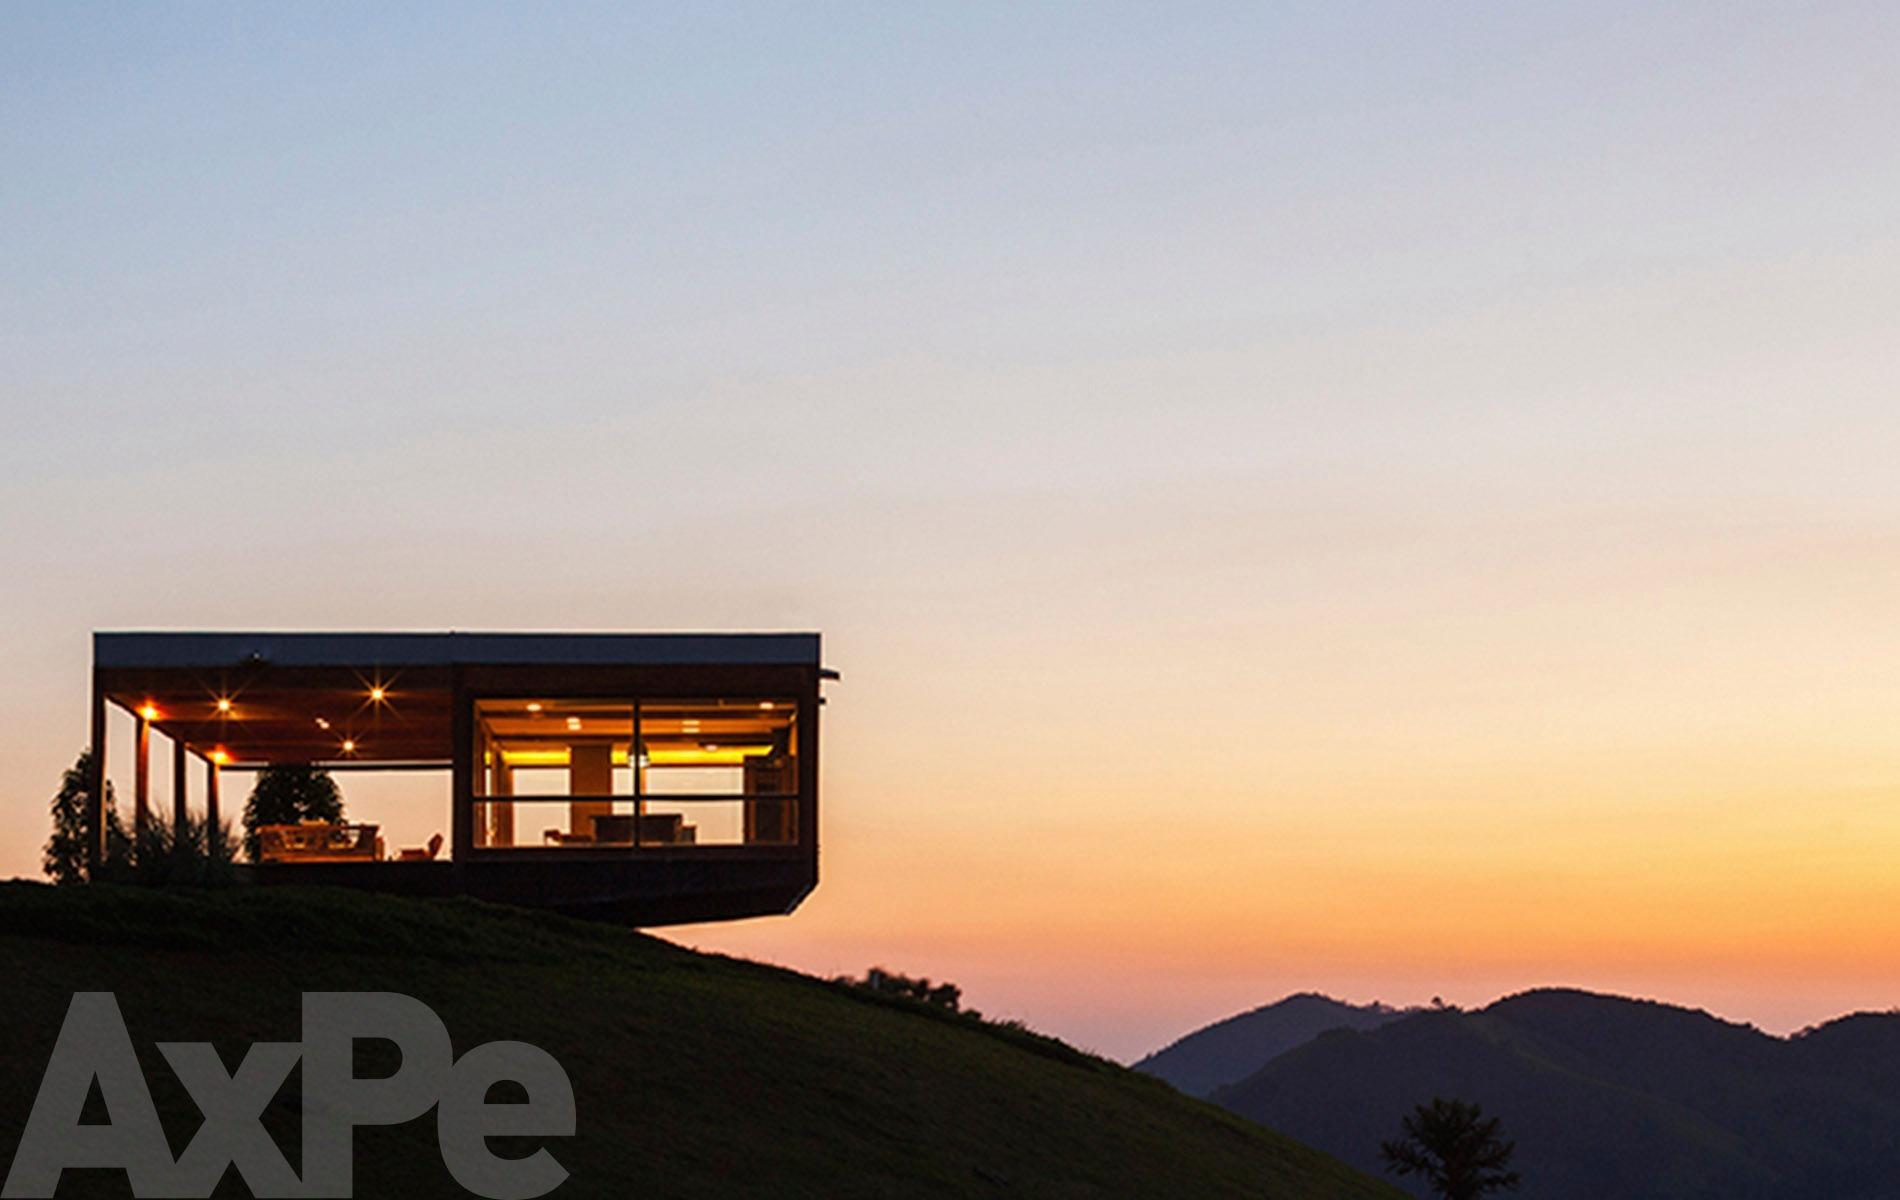 Axpe Casa - AX125082